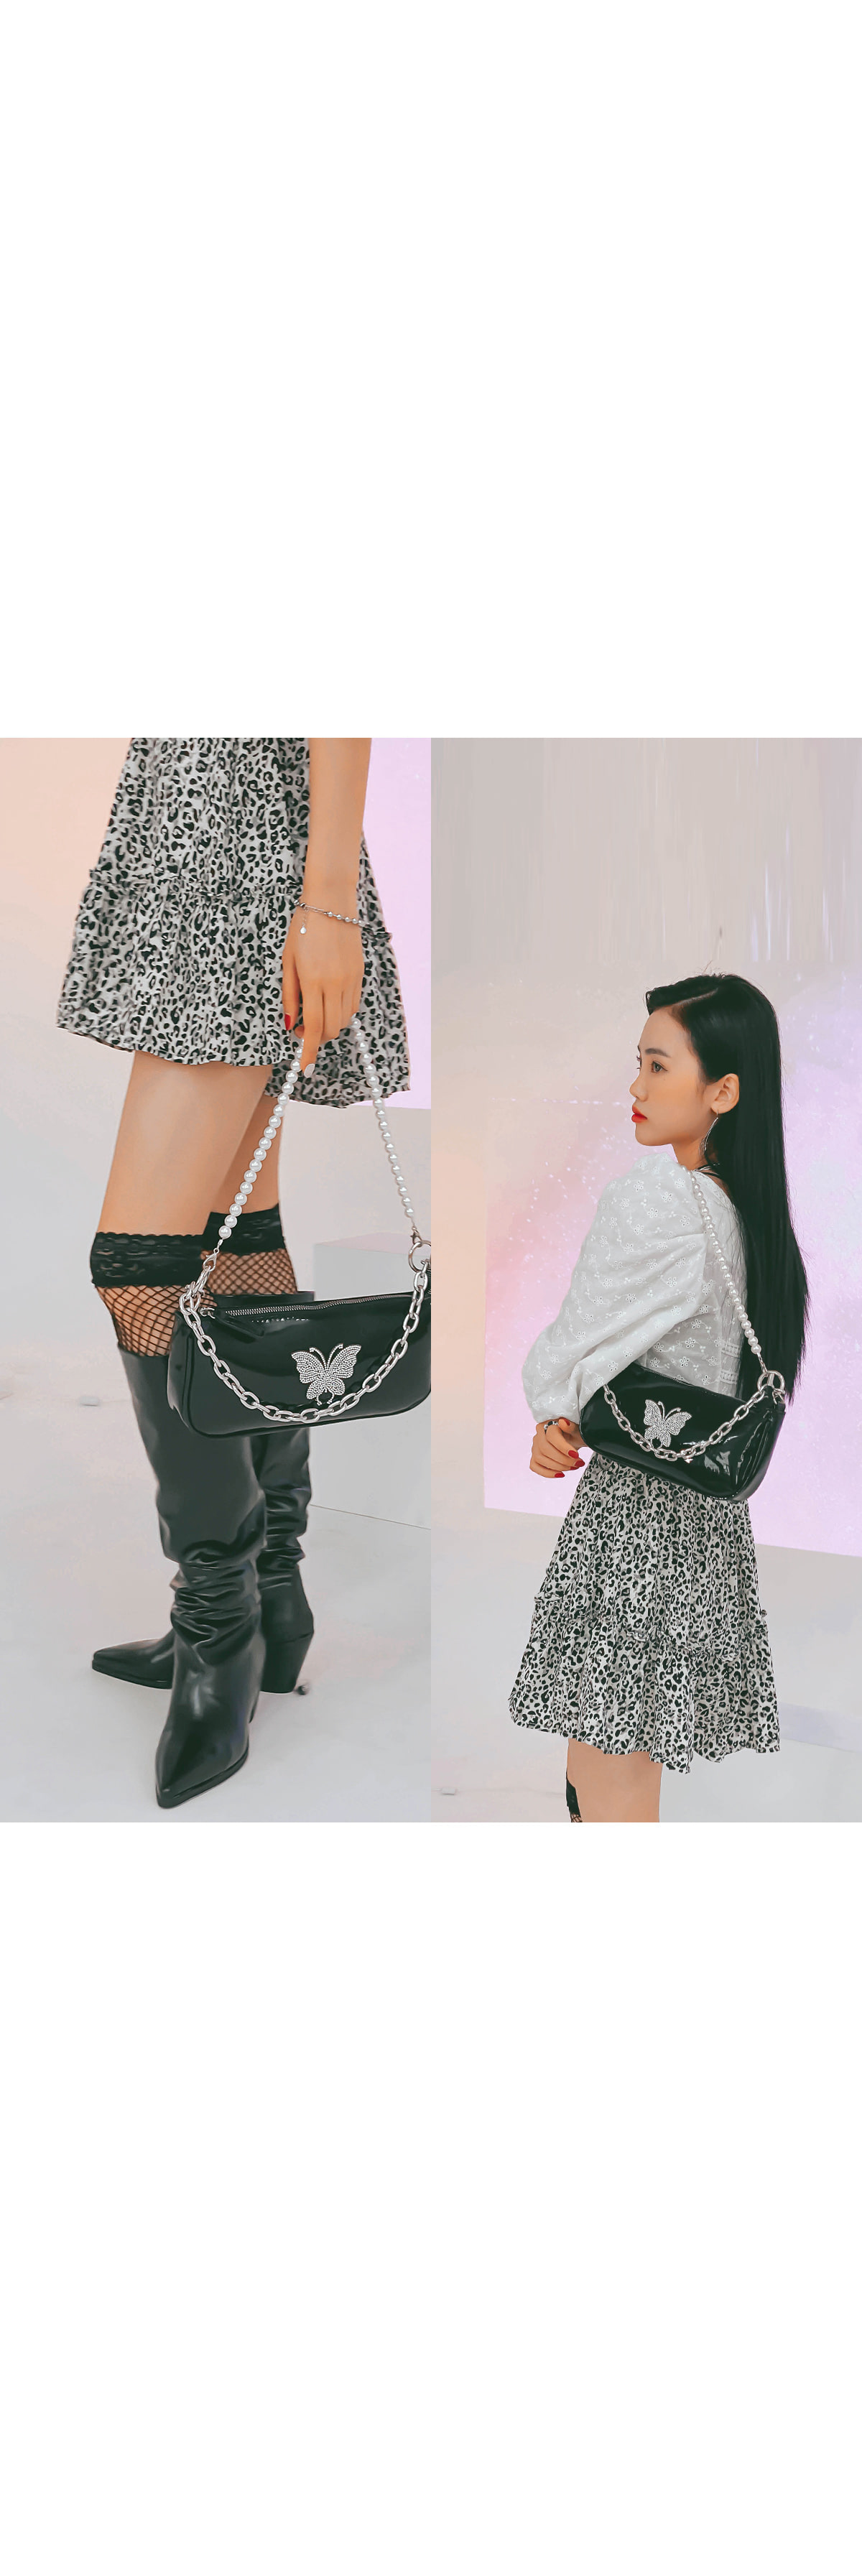 Leopard rib skirt pants